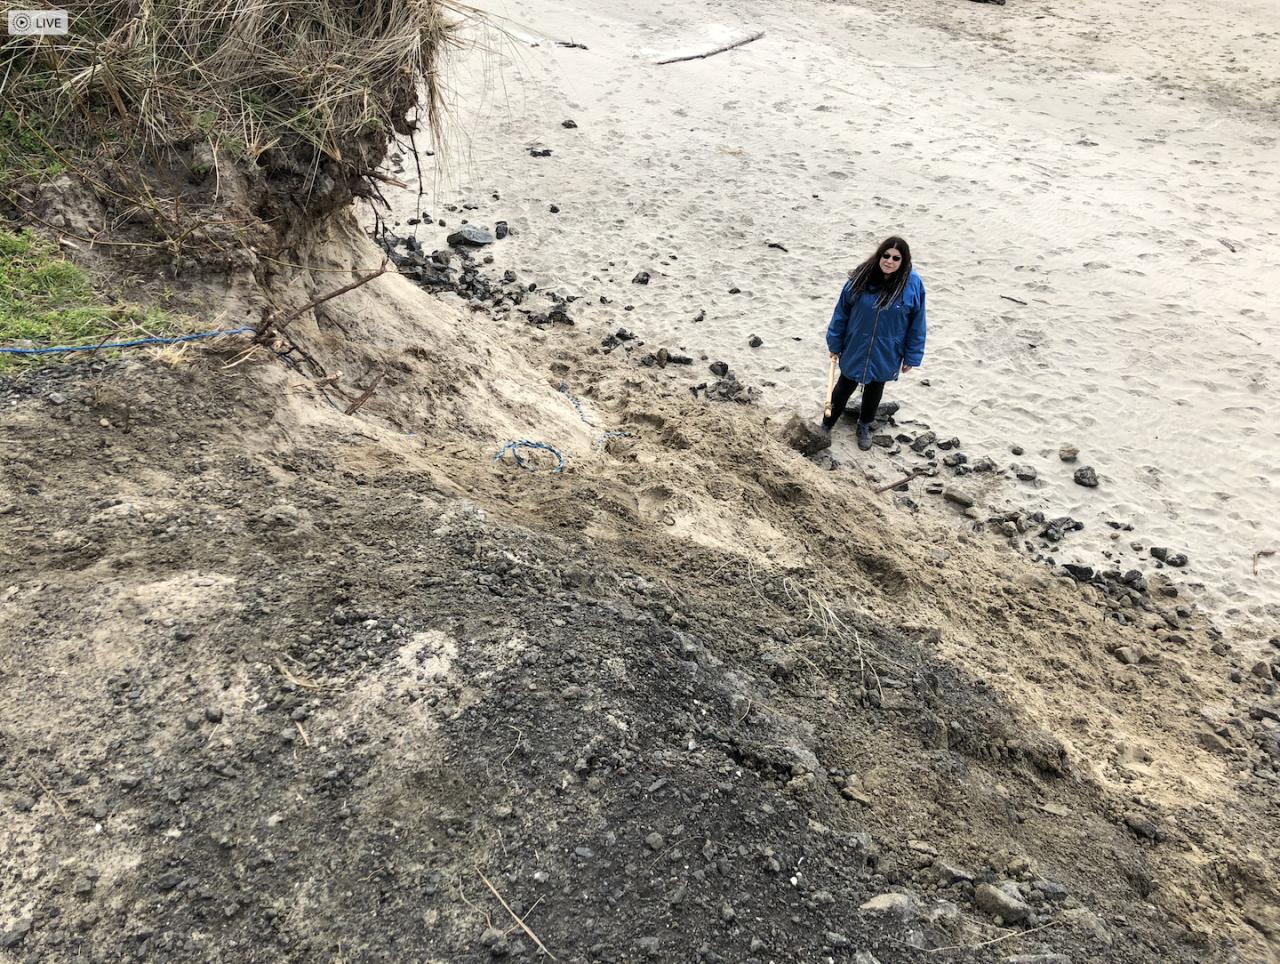 Wakonda Beach beach access erosion from King Tides